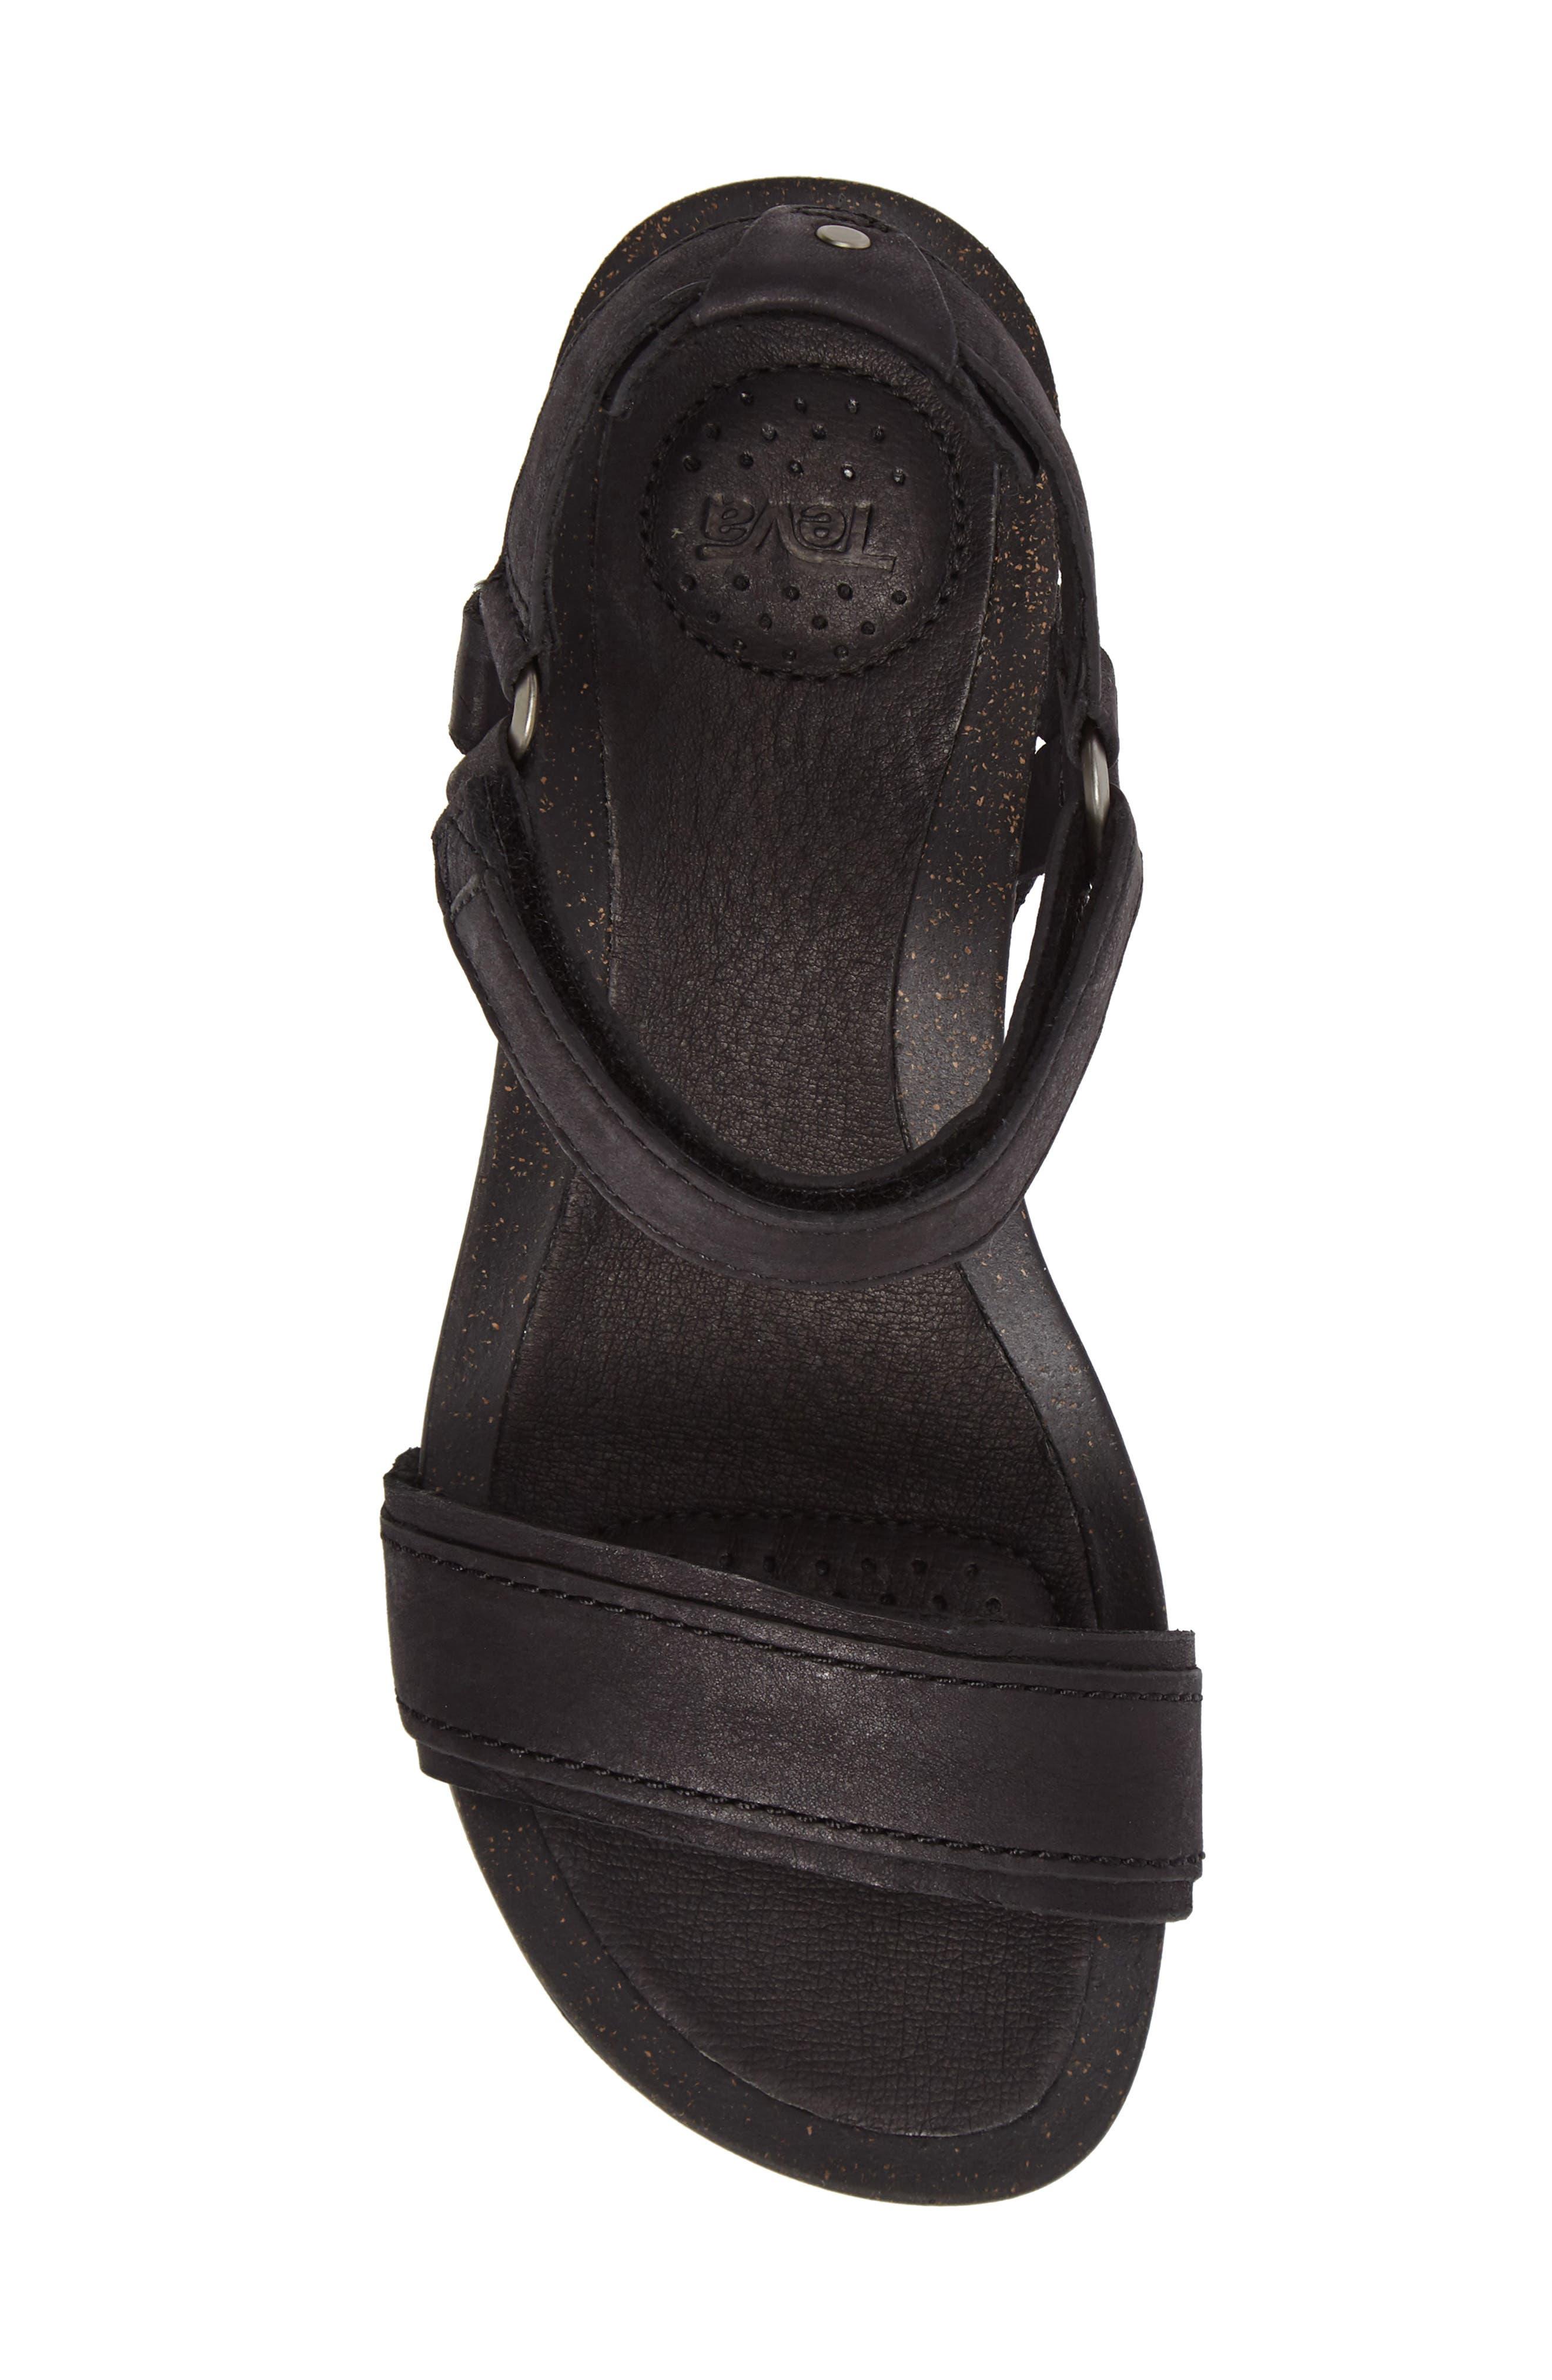 Ysidro Stitch Wedge Sandal,                             Alternate thumbnail 5, color,                             Black Leather